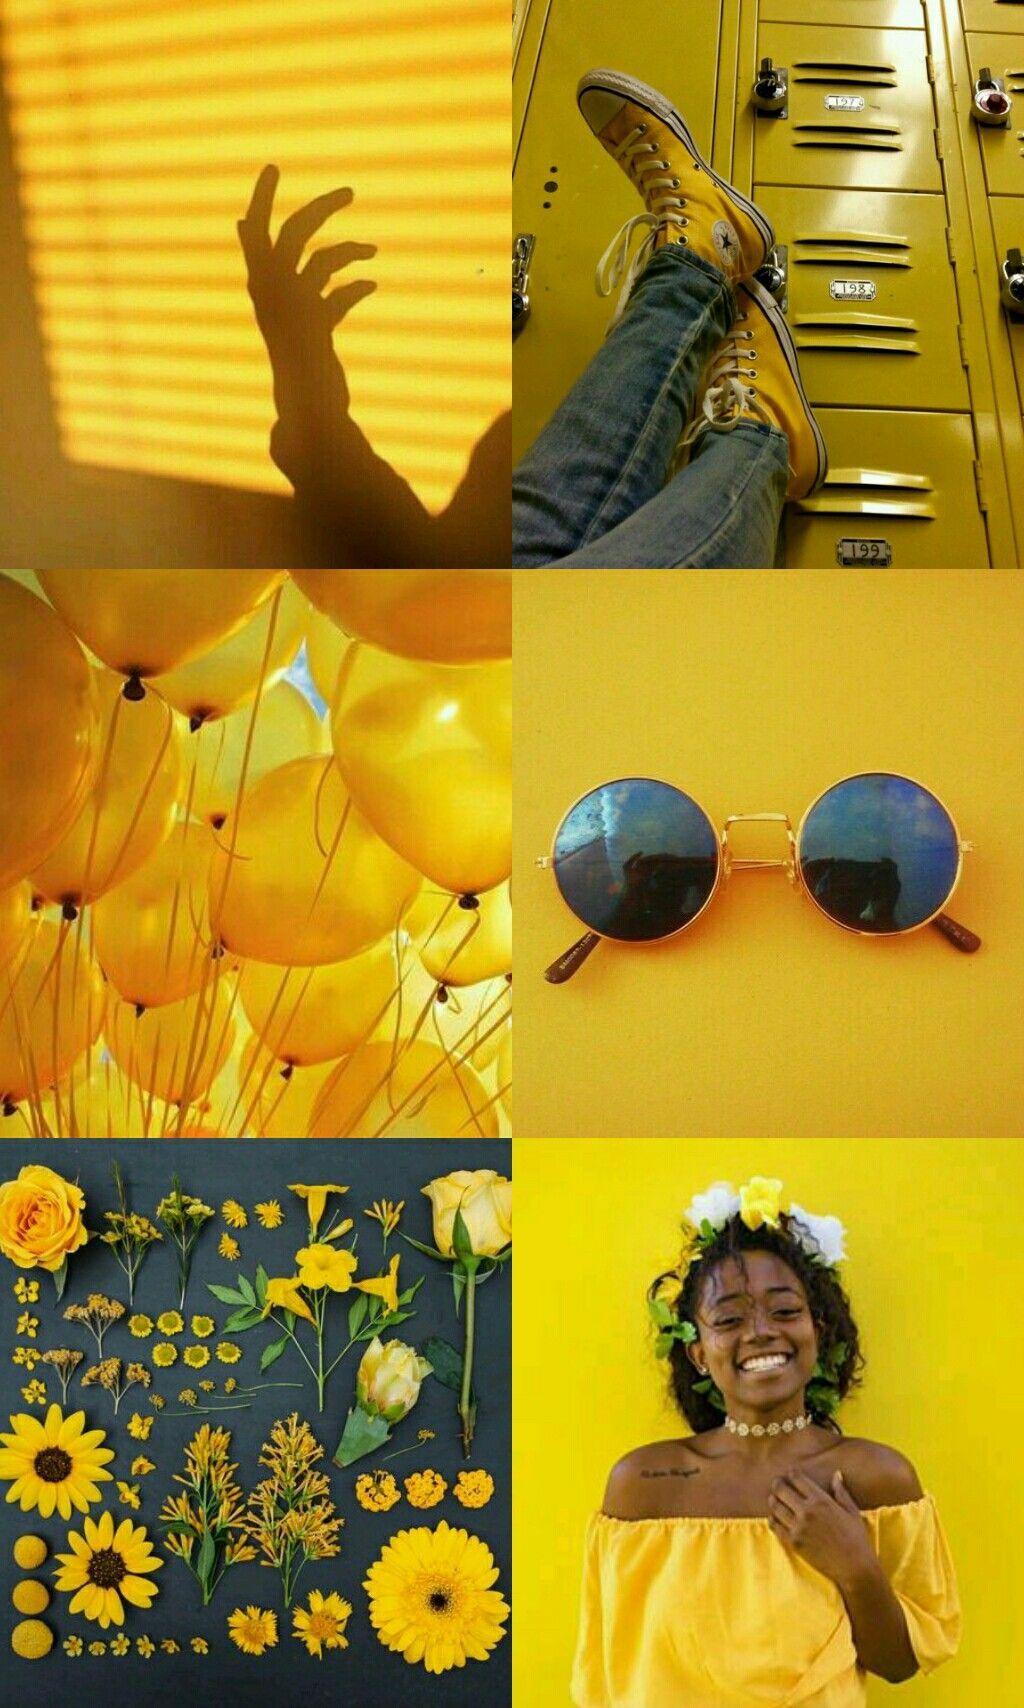 Aesthetic Yellow Background Plain